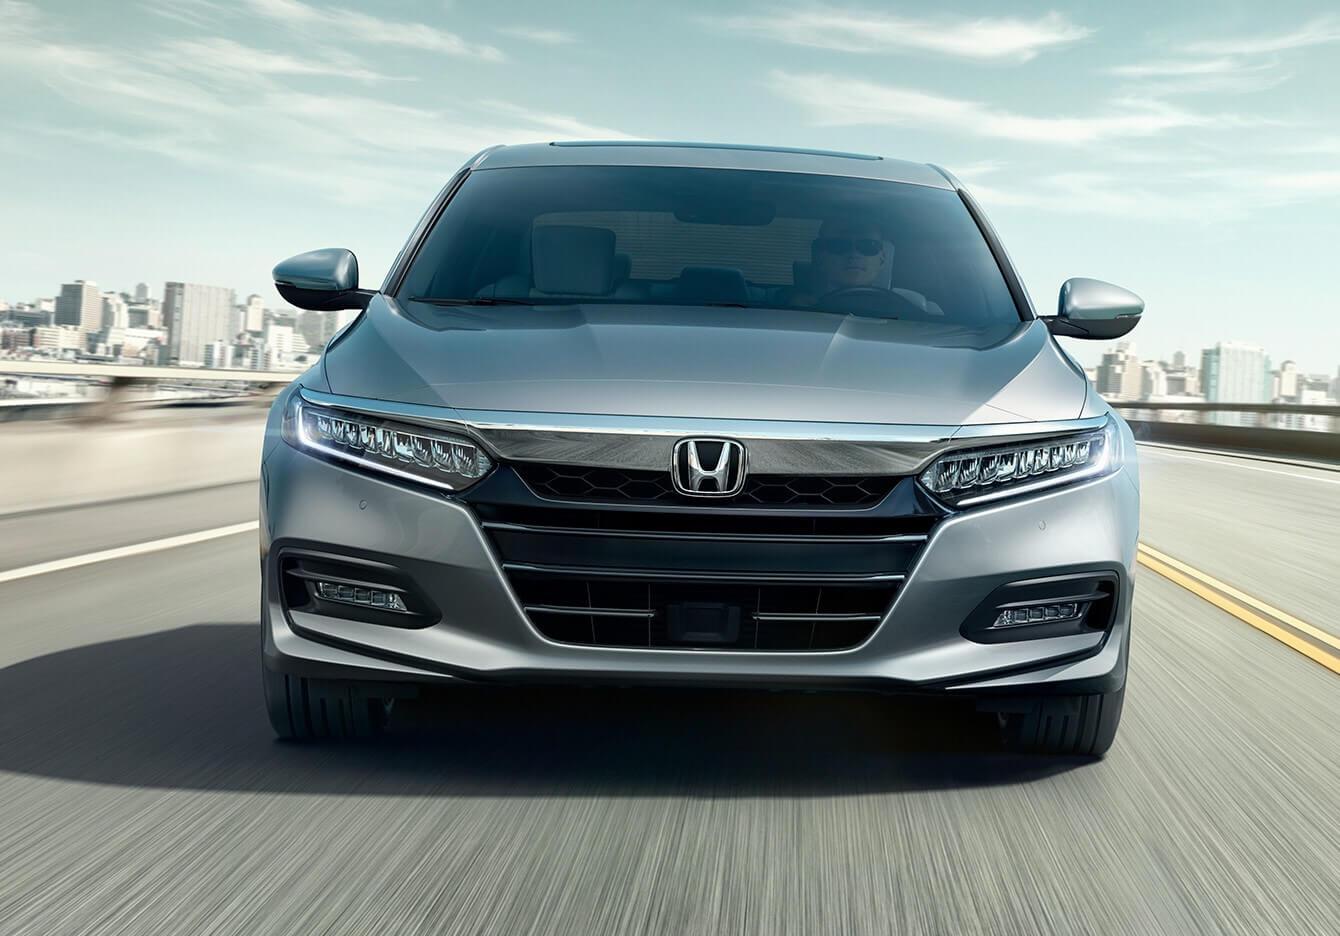 2020 Honda Accord Trim Levels Slider